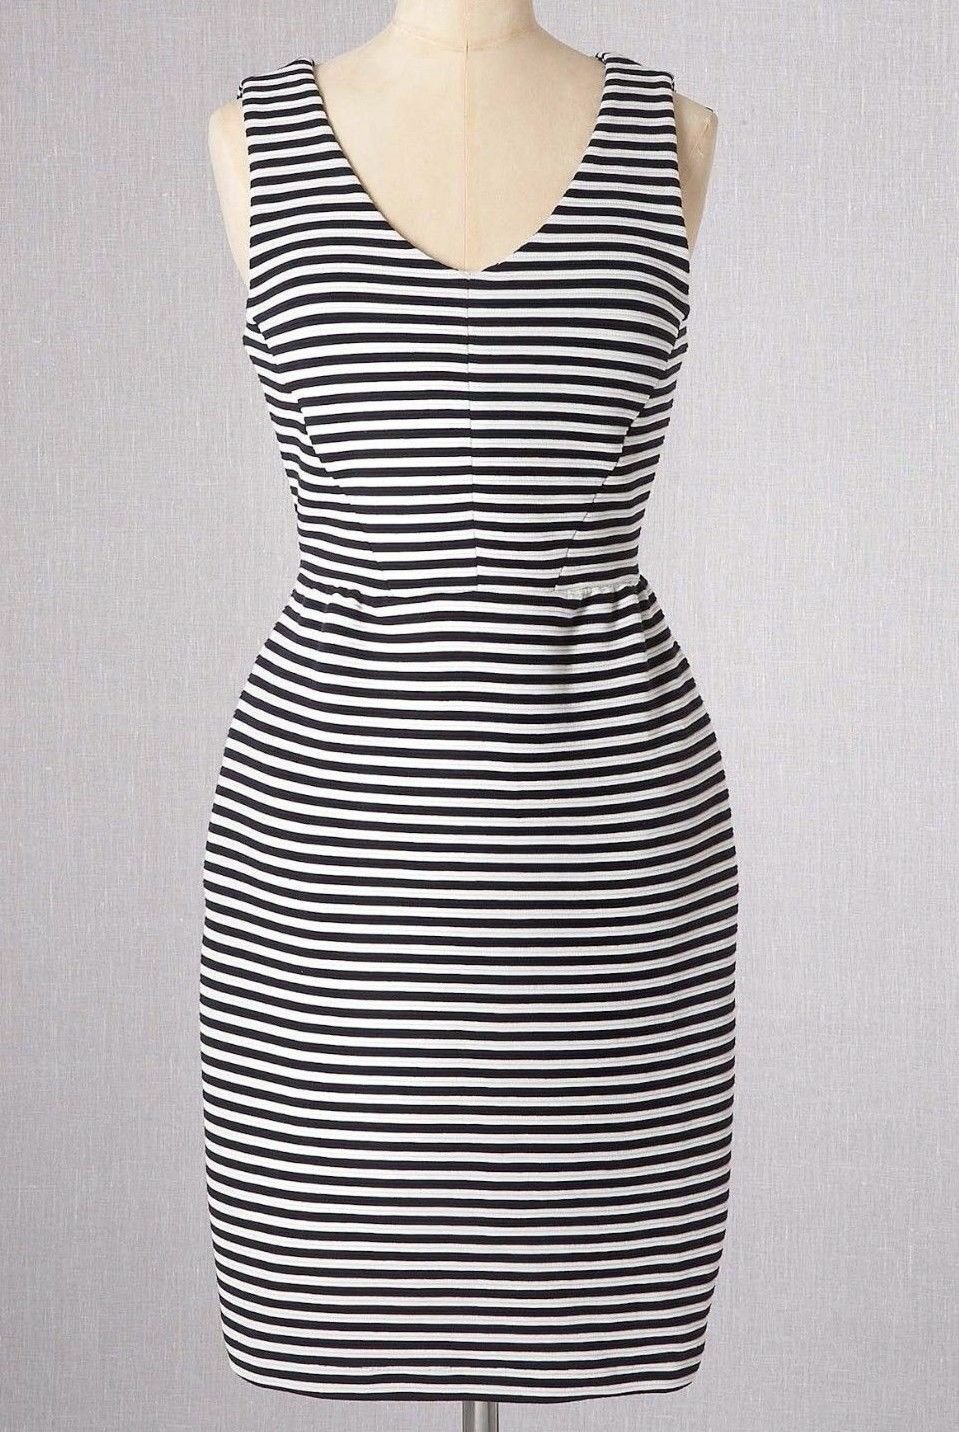 New Boden  Striped Vintage Ponte Shift Dress Size US 8